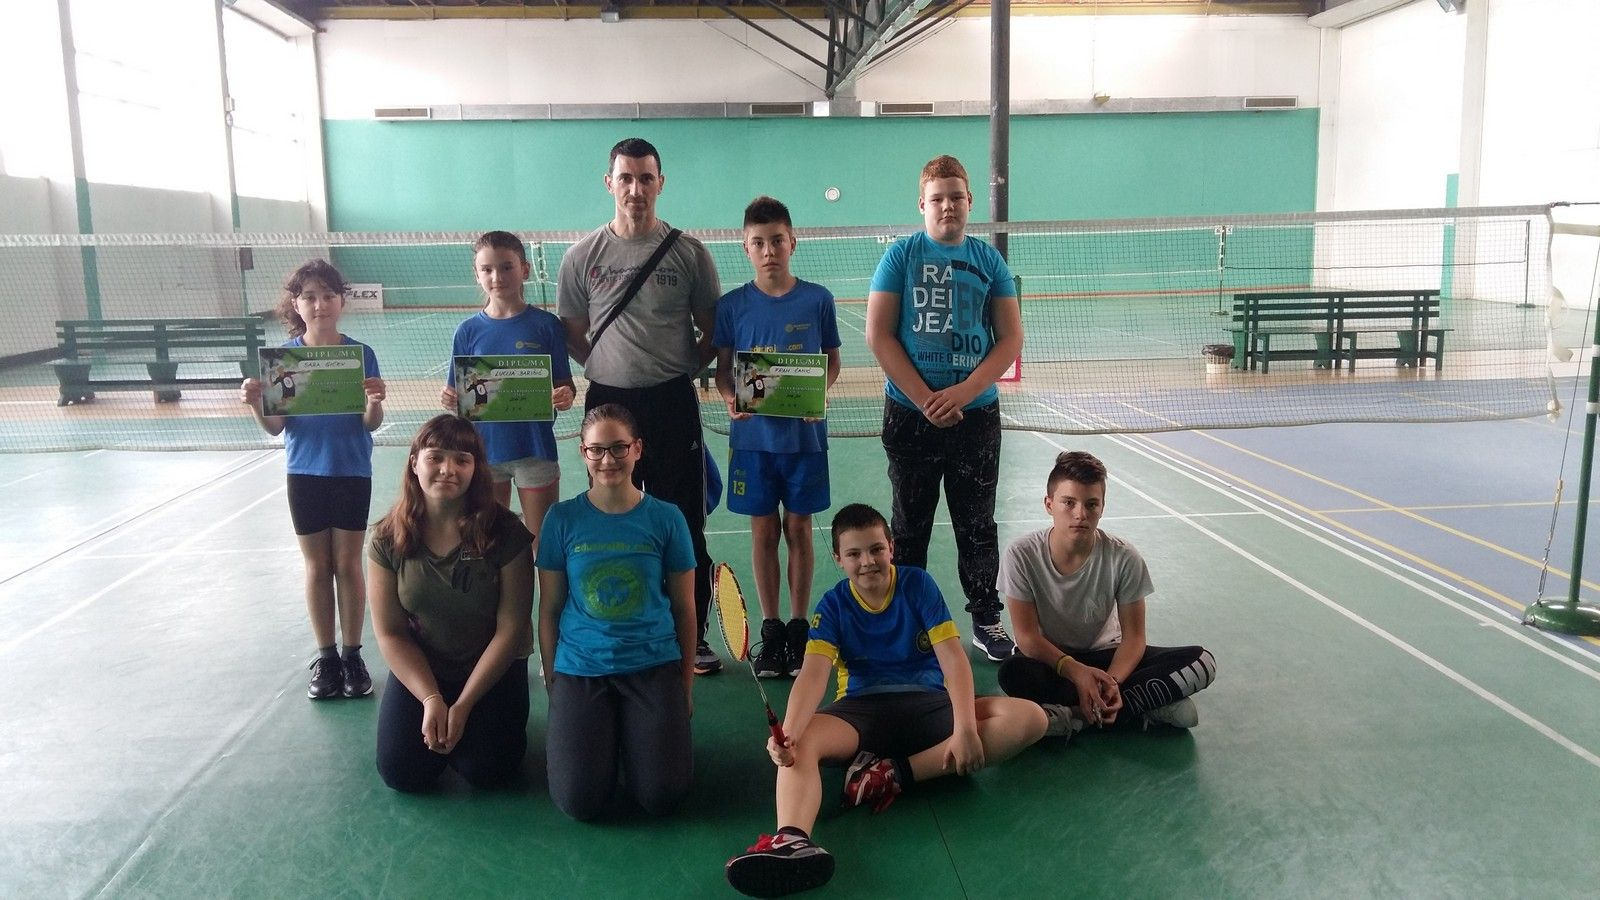 2017 5 badminton 2